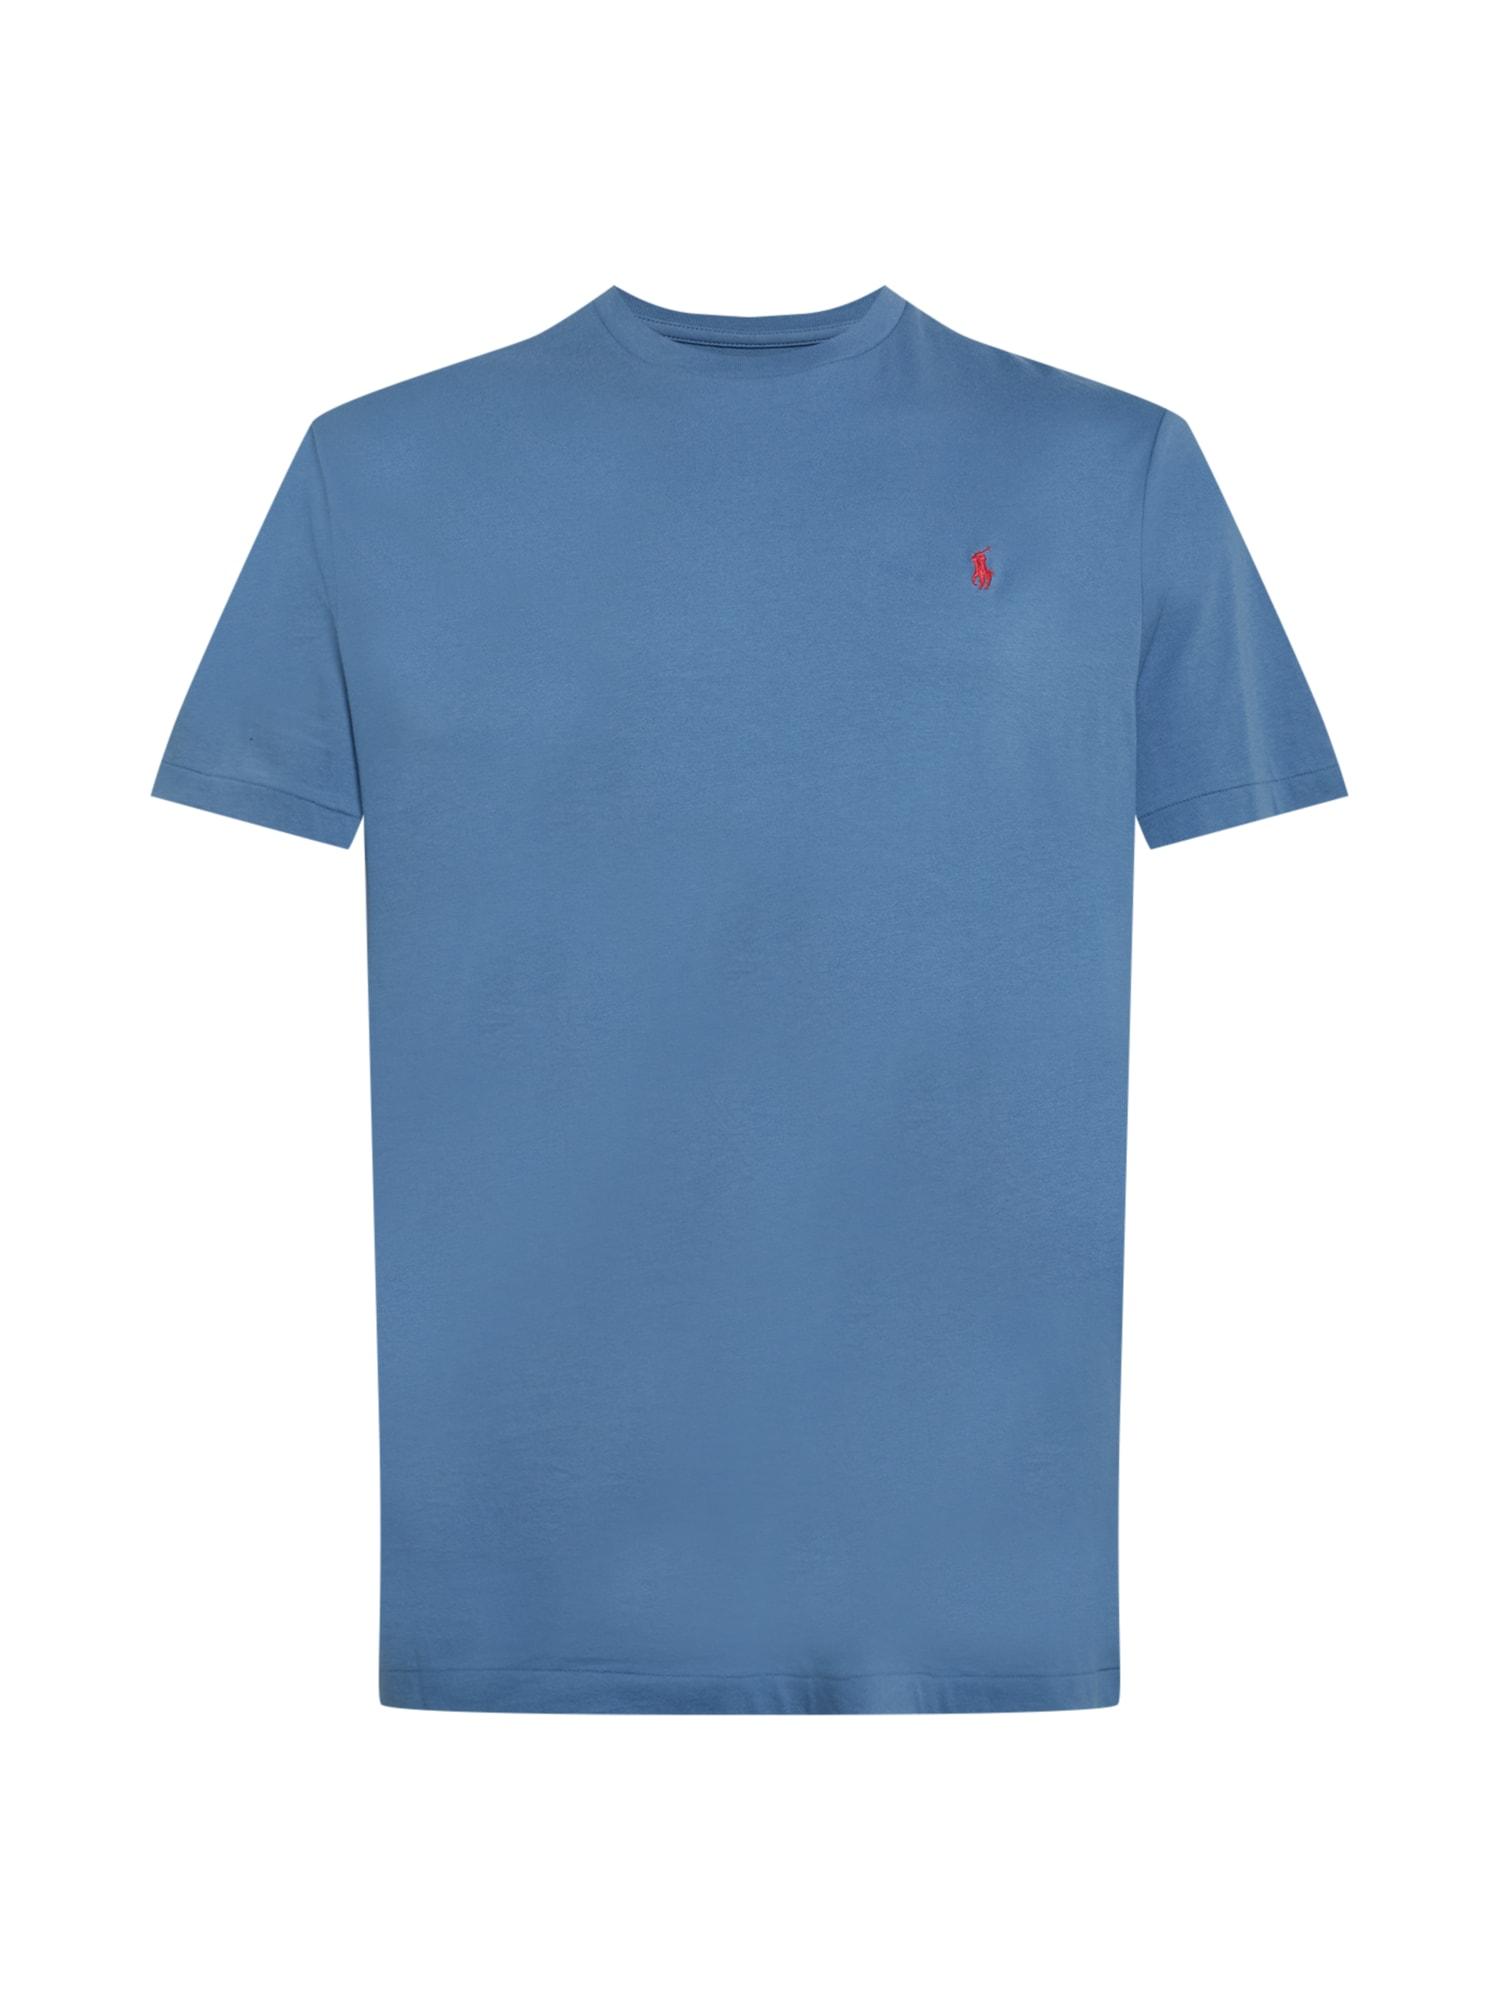 Polo Ralph Lauren Big & Tall Marškinėliai mėlyna dūmų spalva